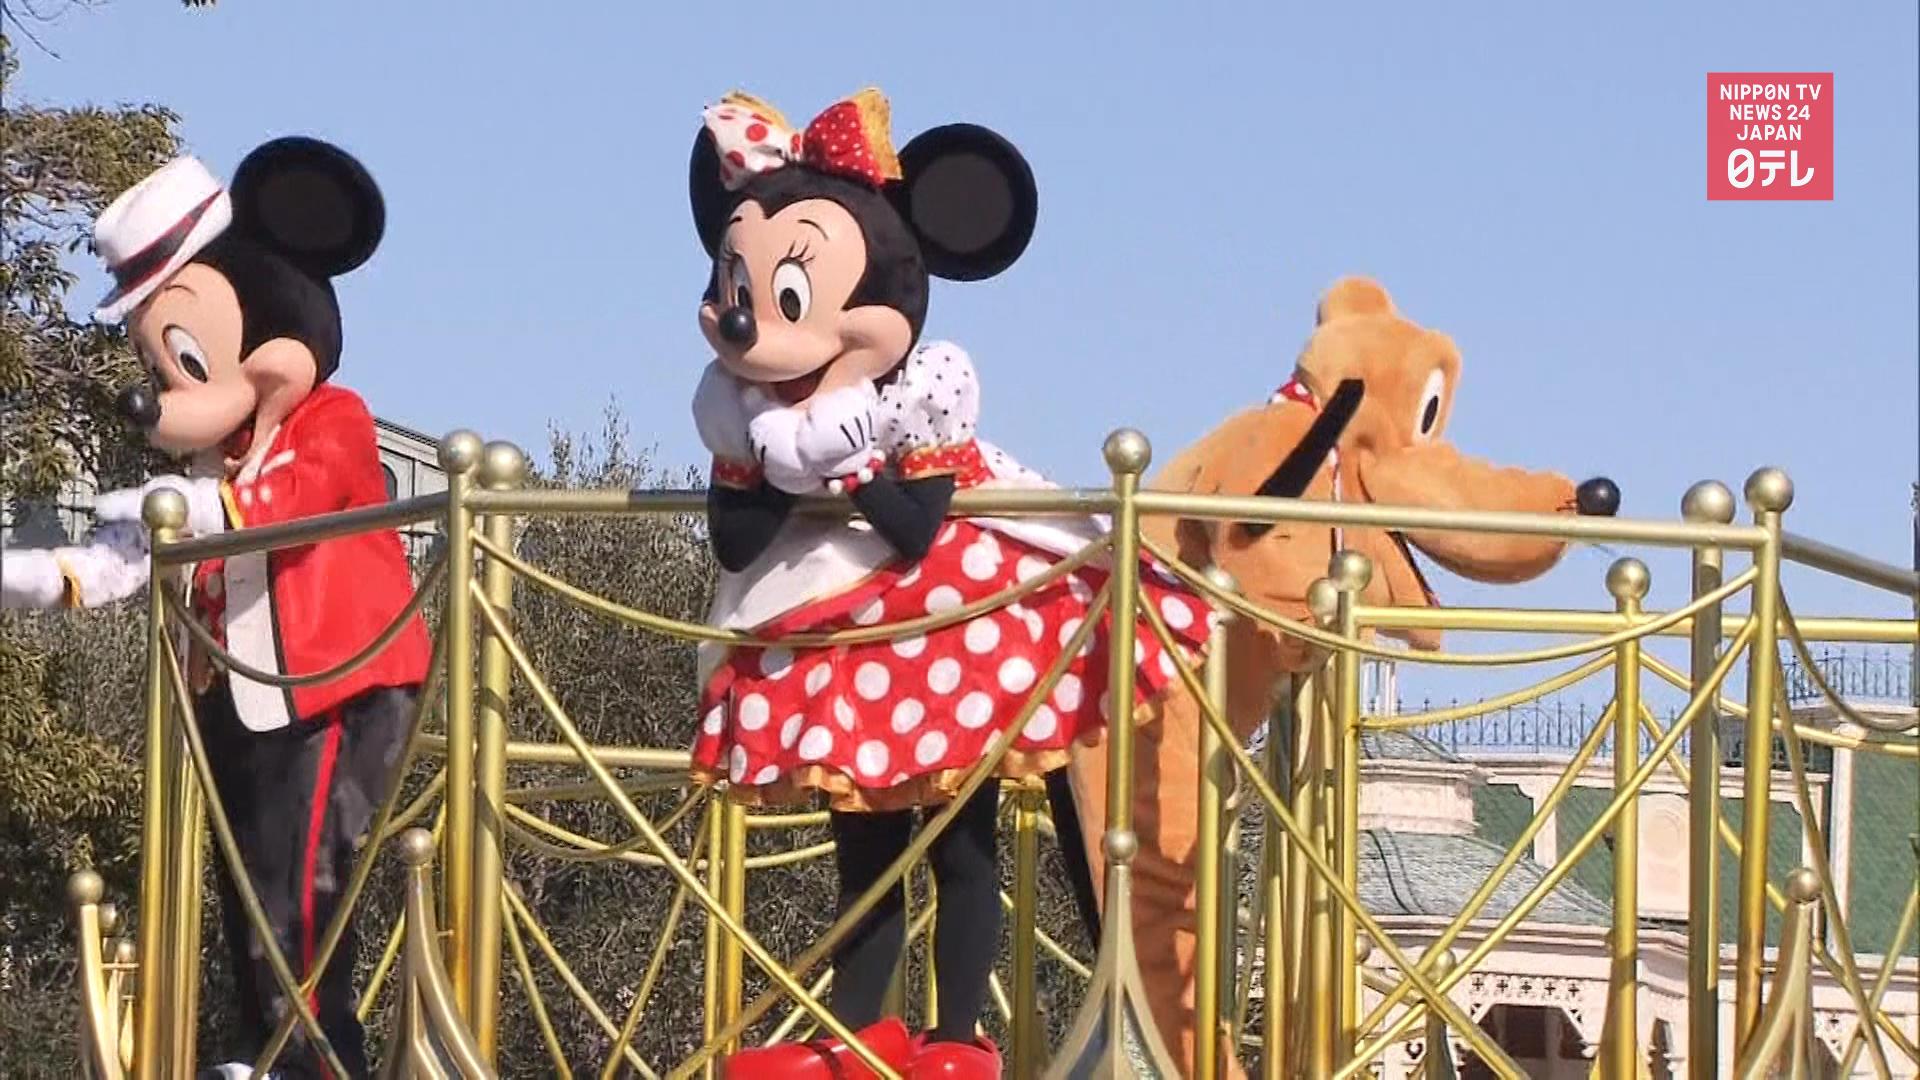 Tokyo Disneyland's new Minnie parade